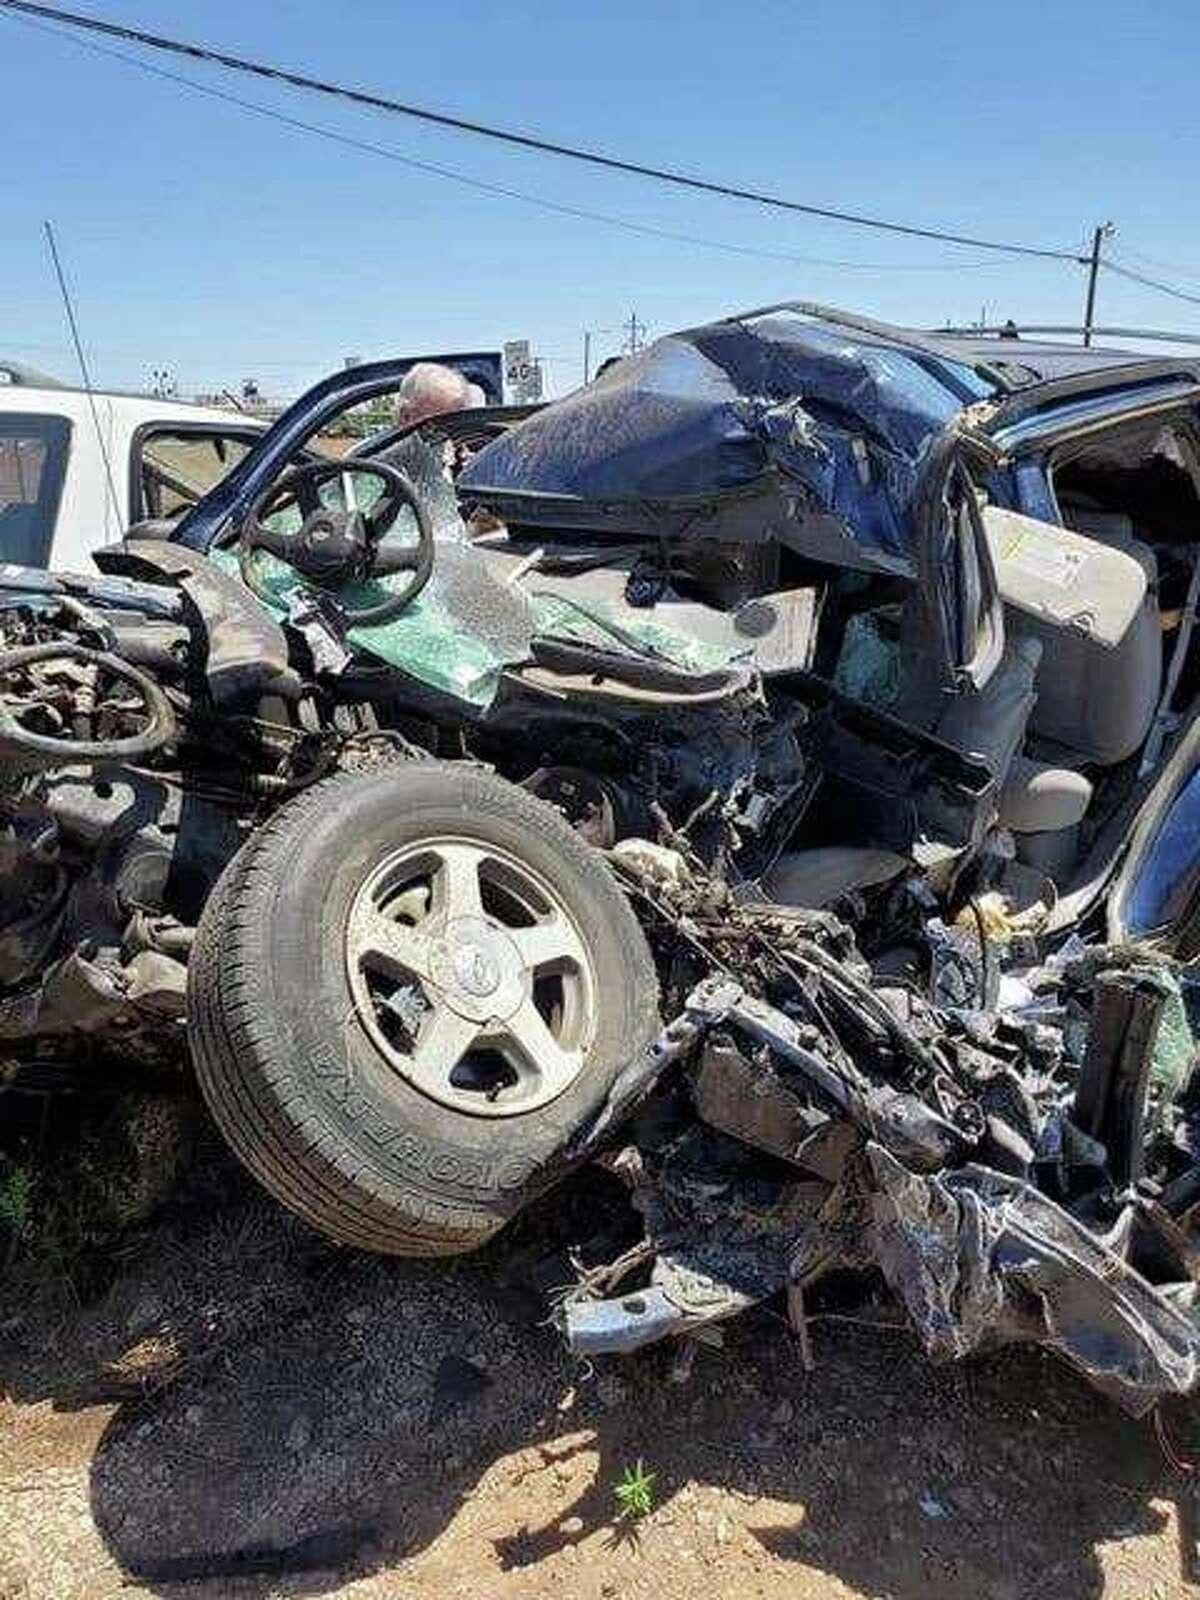 Joshua Fowler broke 27 bones in a wreck on May 19.